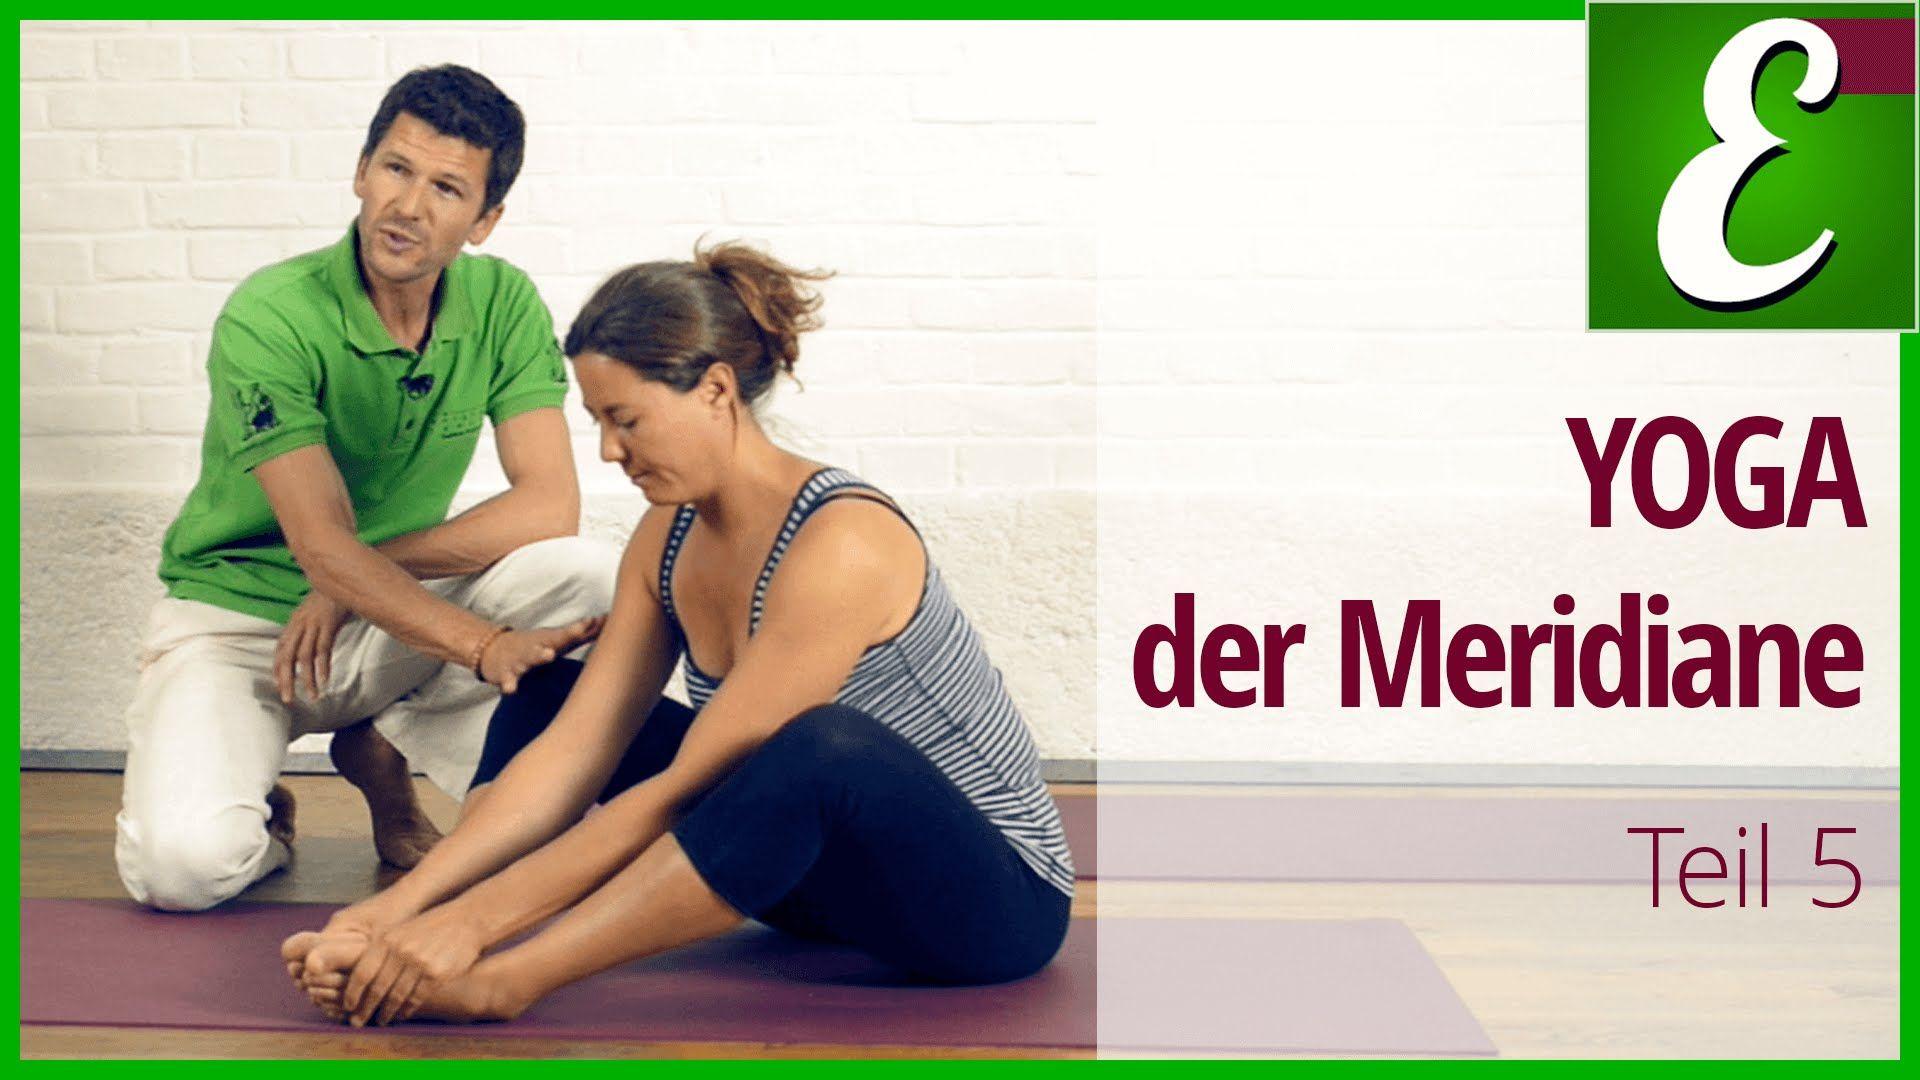 Yoga für Anfänger: Kurs YOGA der Meridiane — Teil 5 | L ...